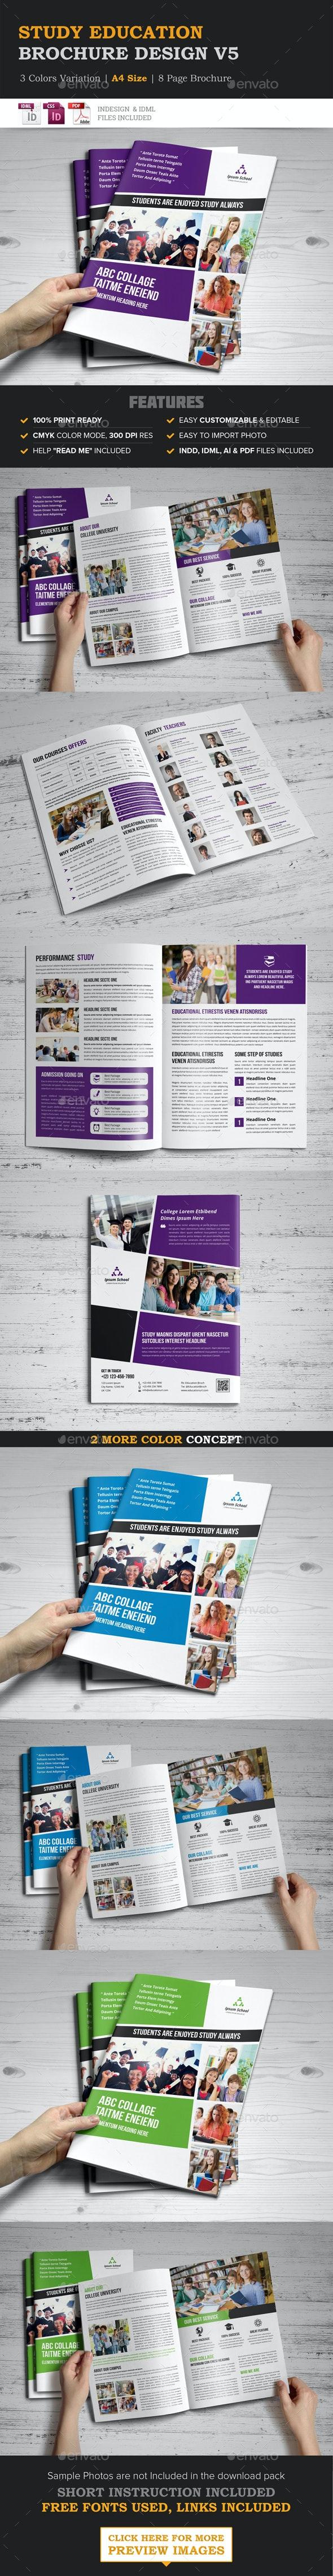 Education Brochure Indesign Template - Corporate Brochures